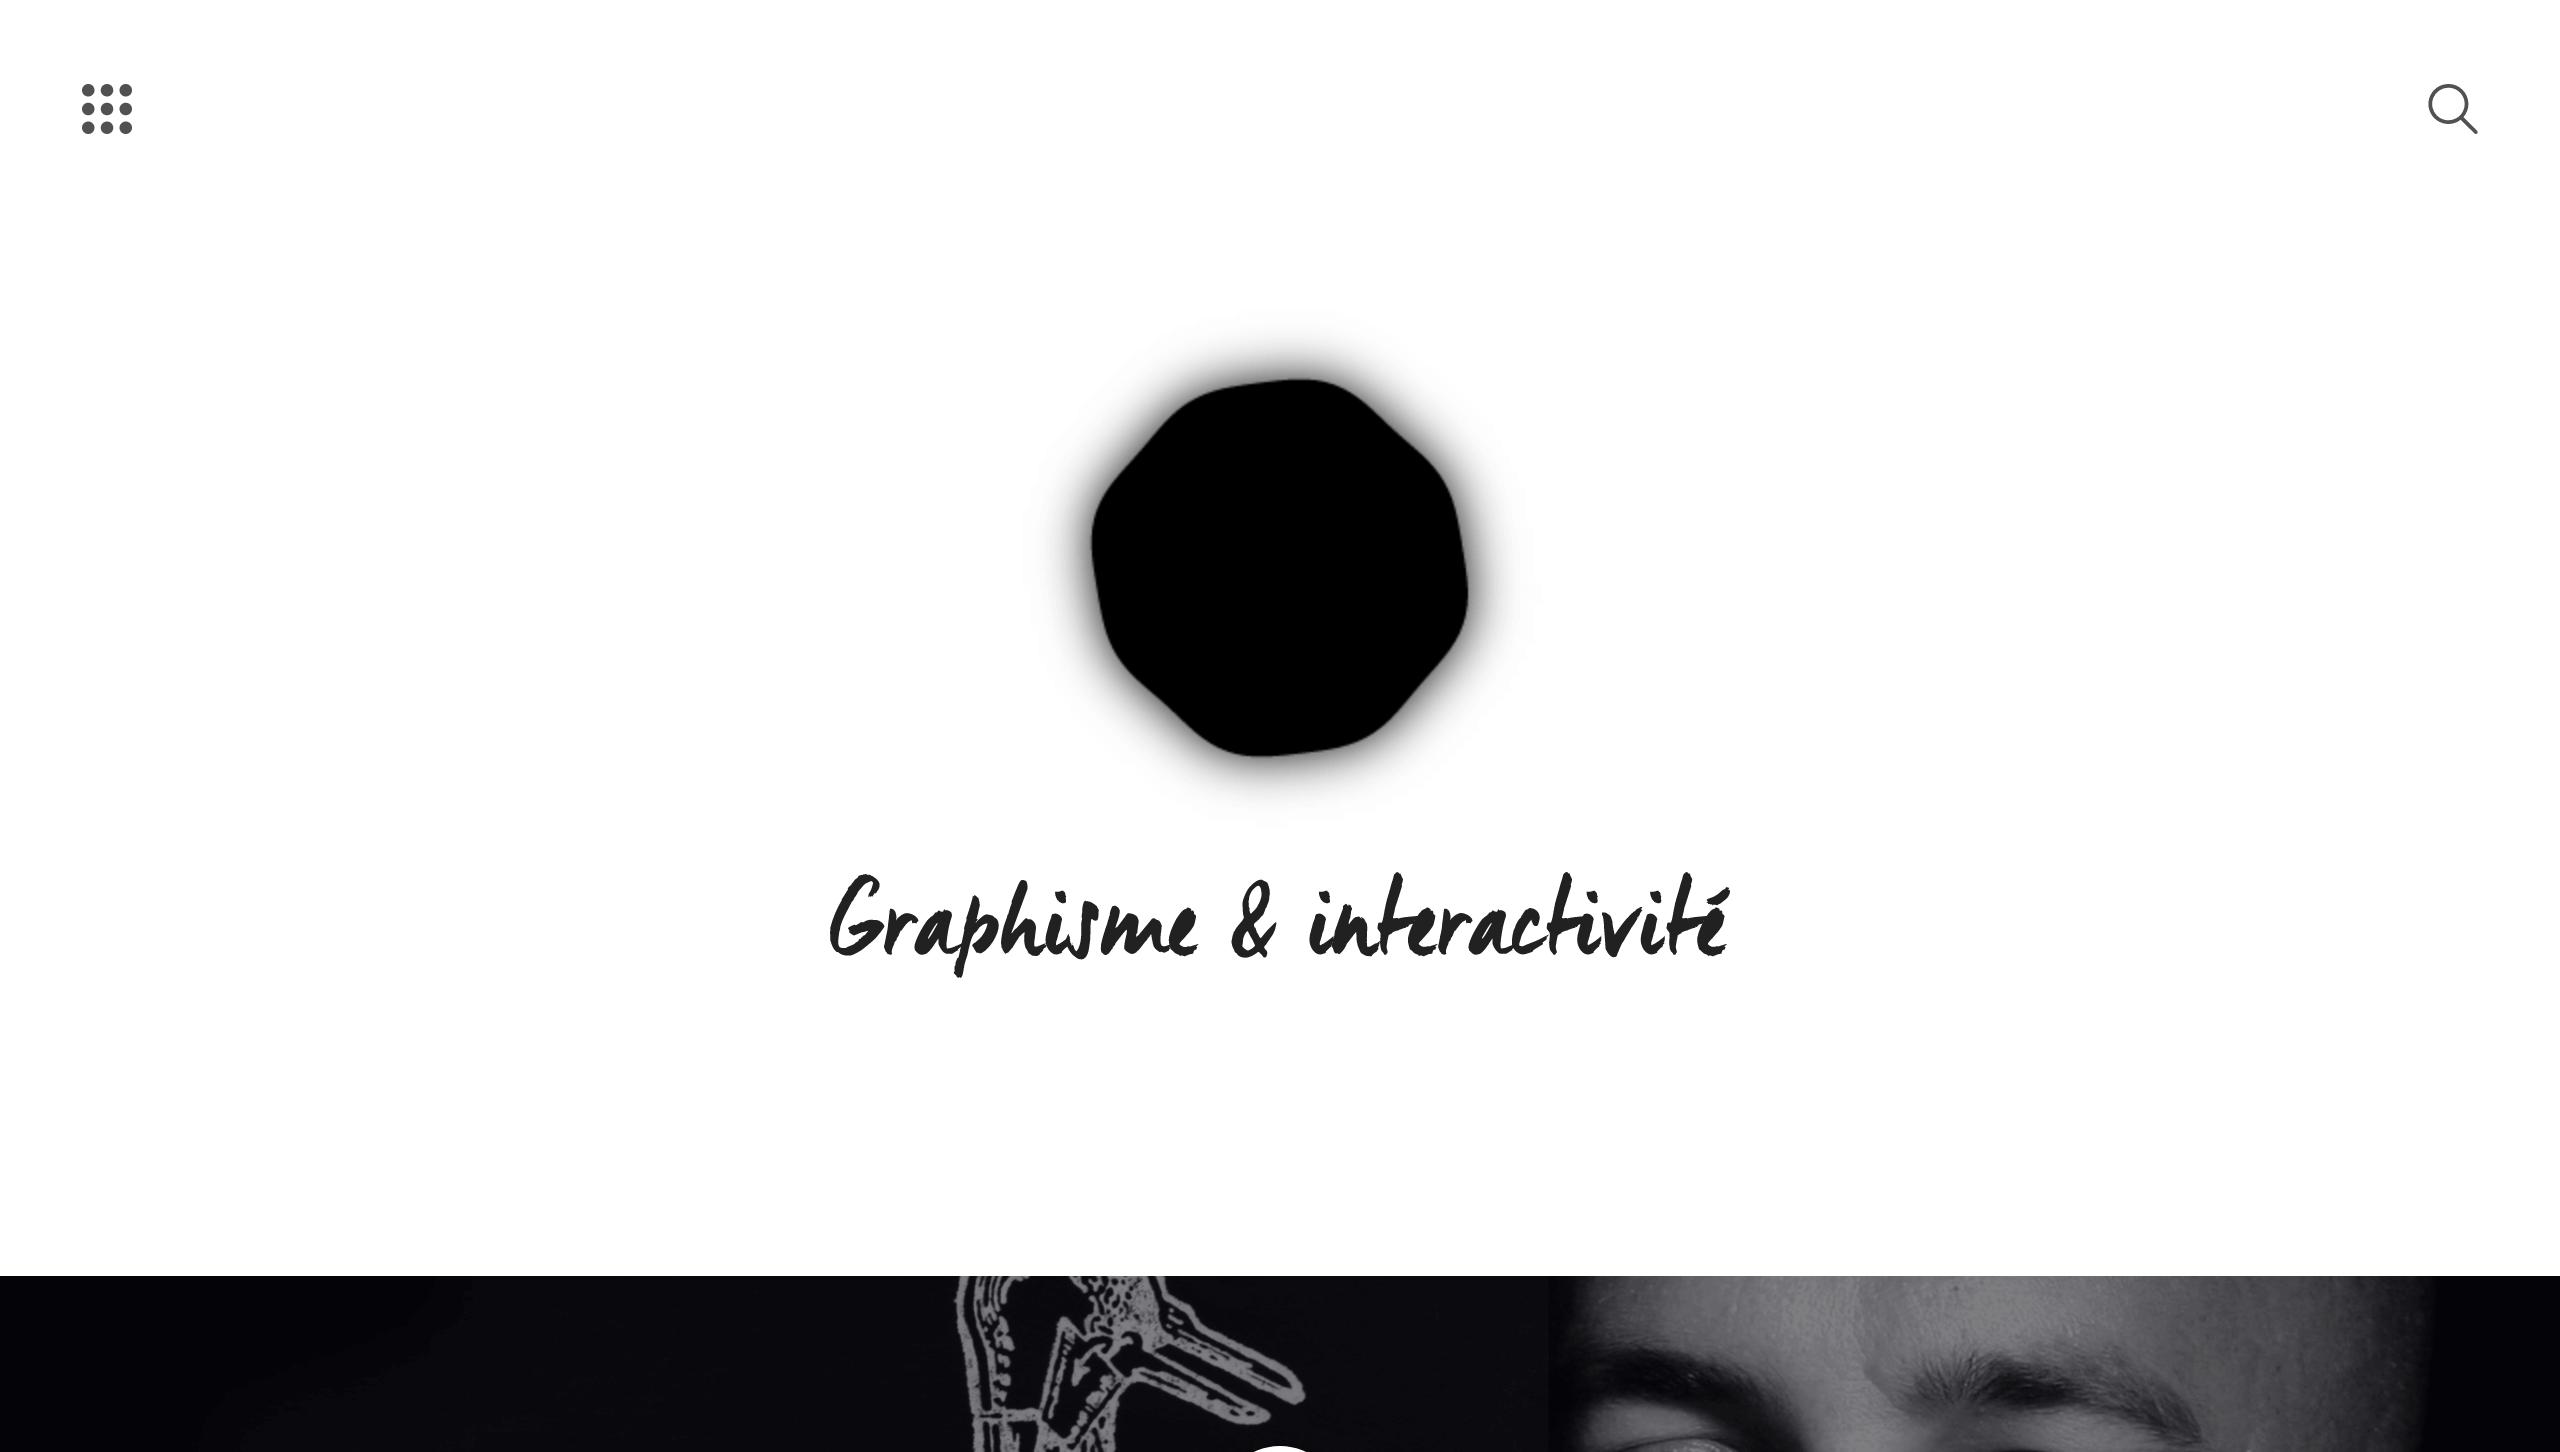 Graphisme-interactivité-Blog-webdesign.png